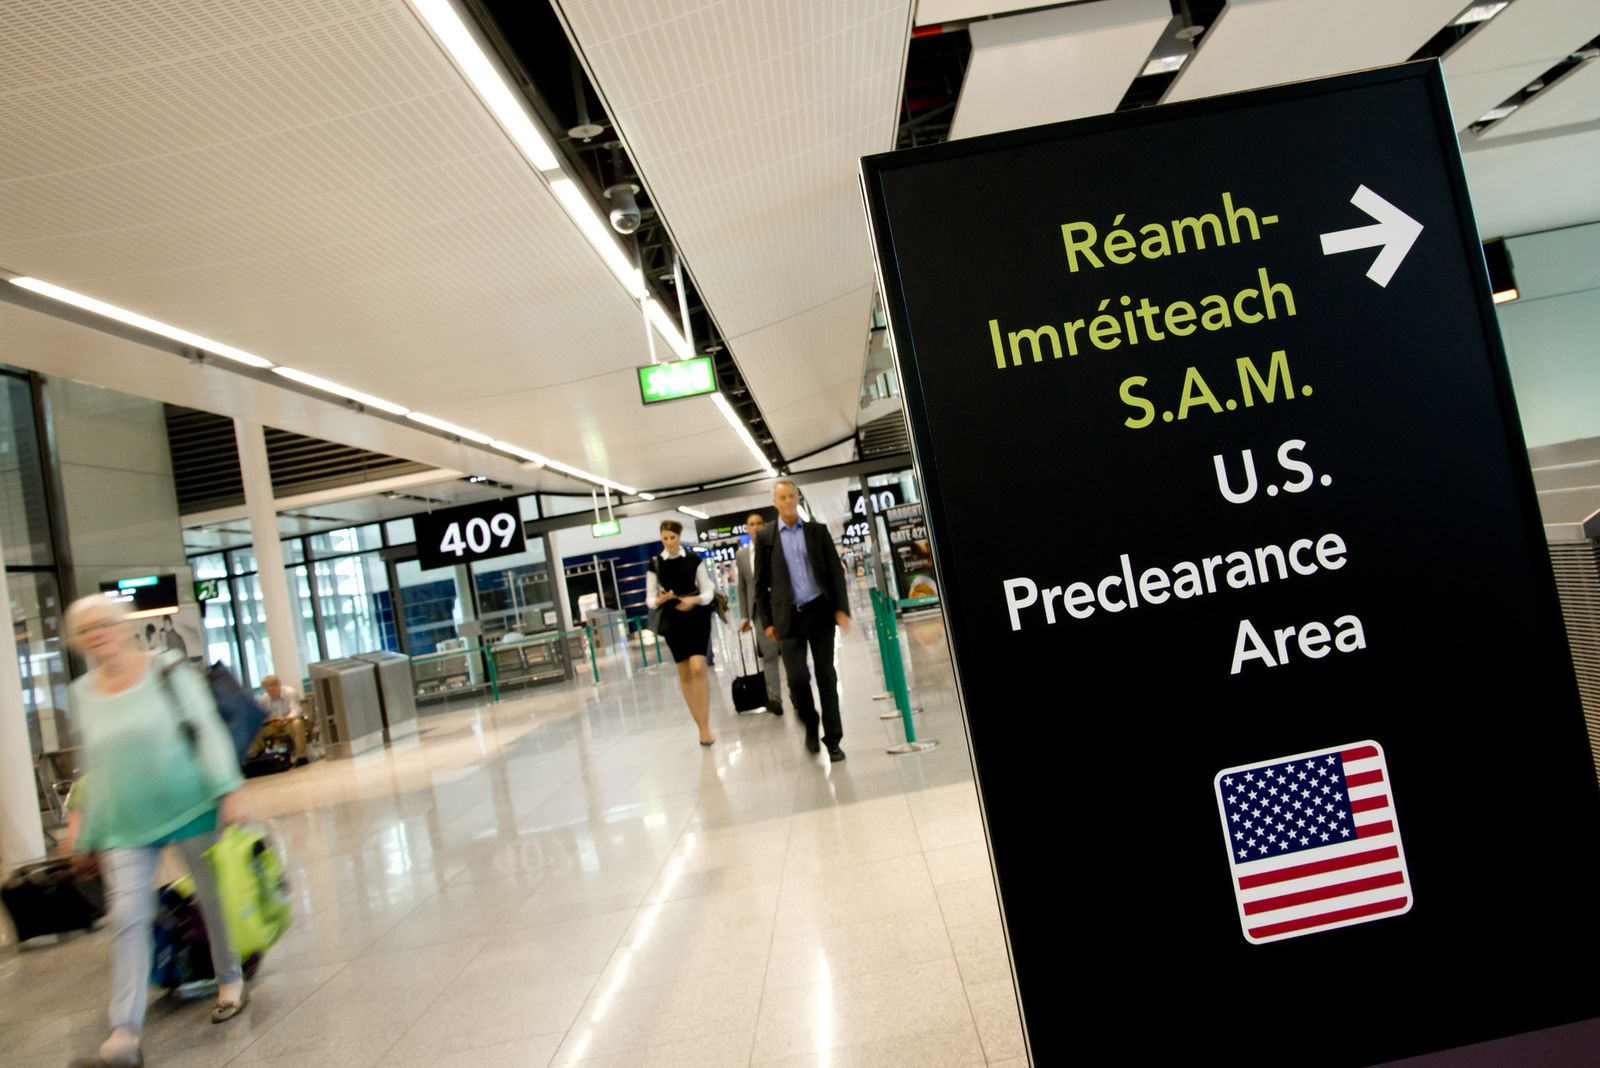 Preclearance Area am Flughafen